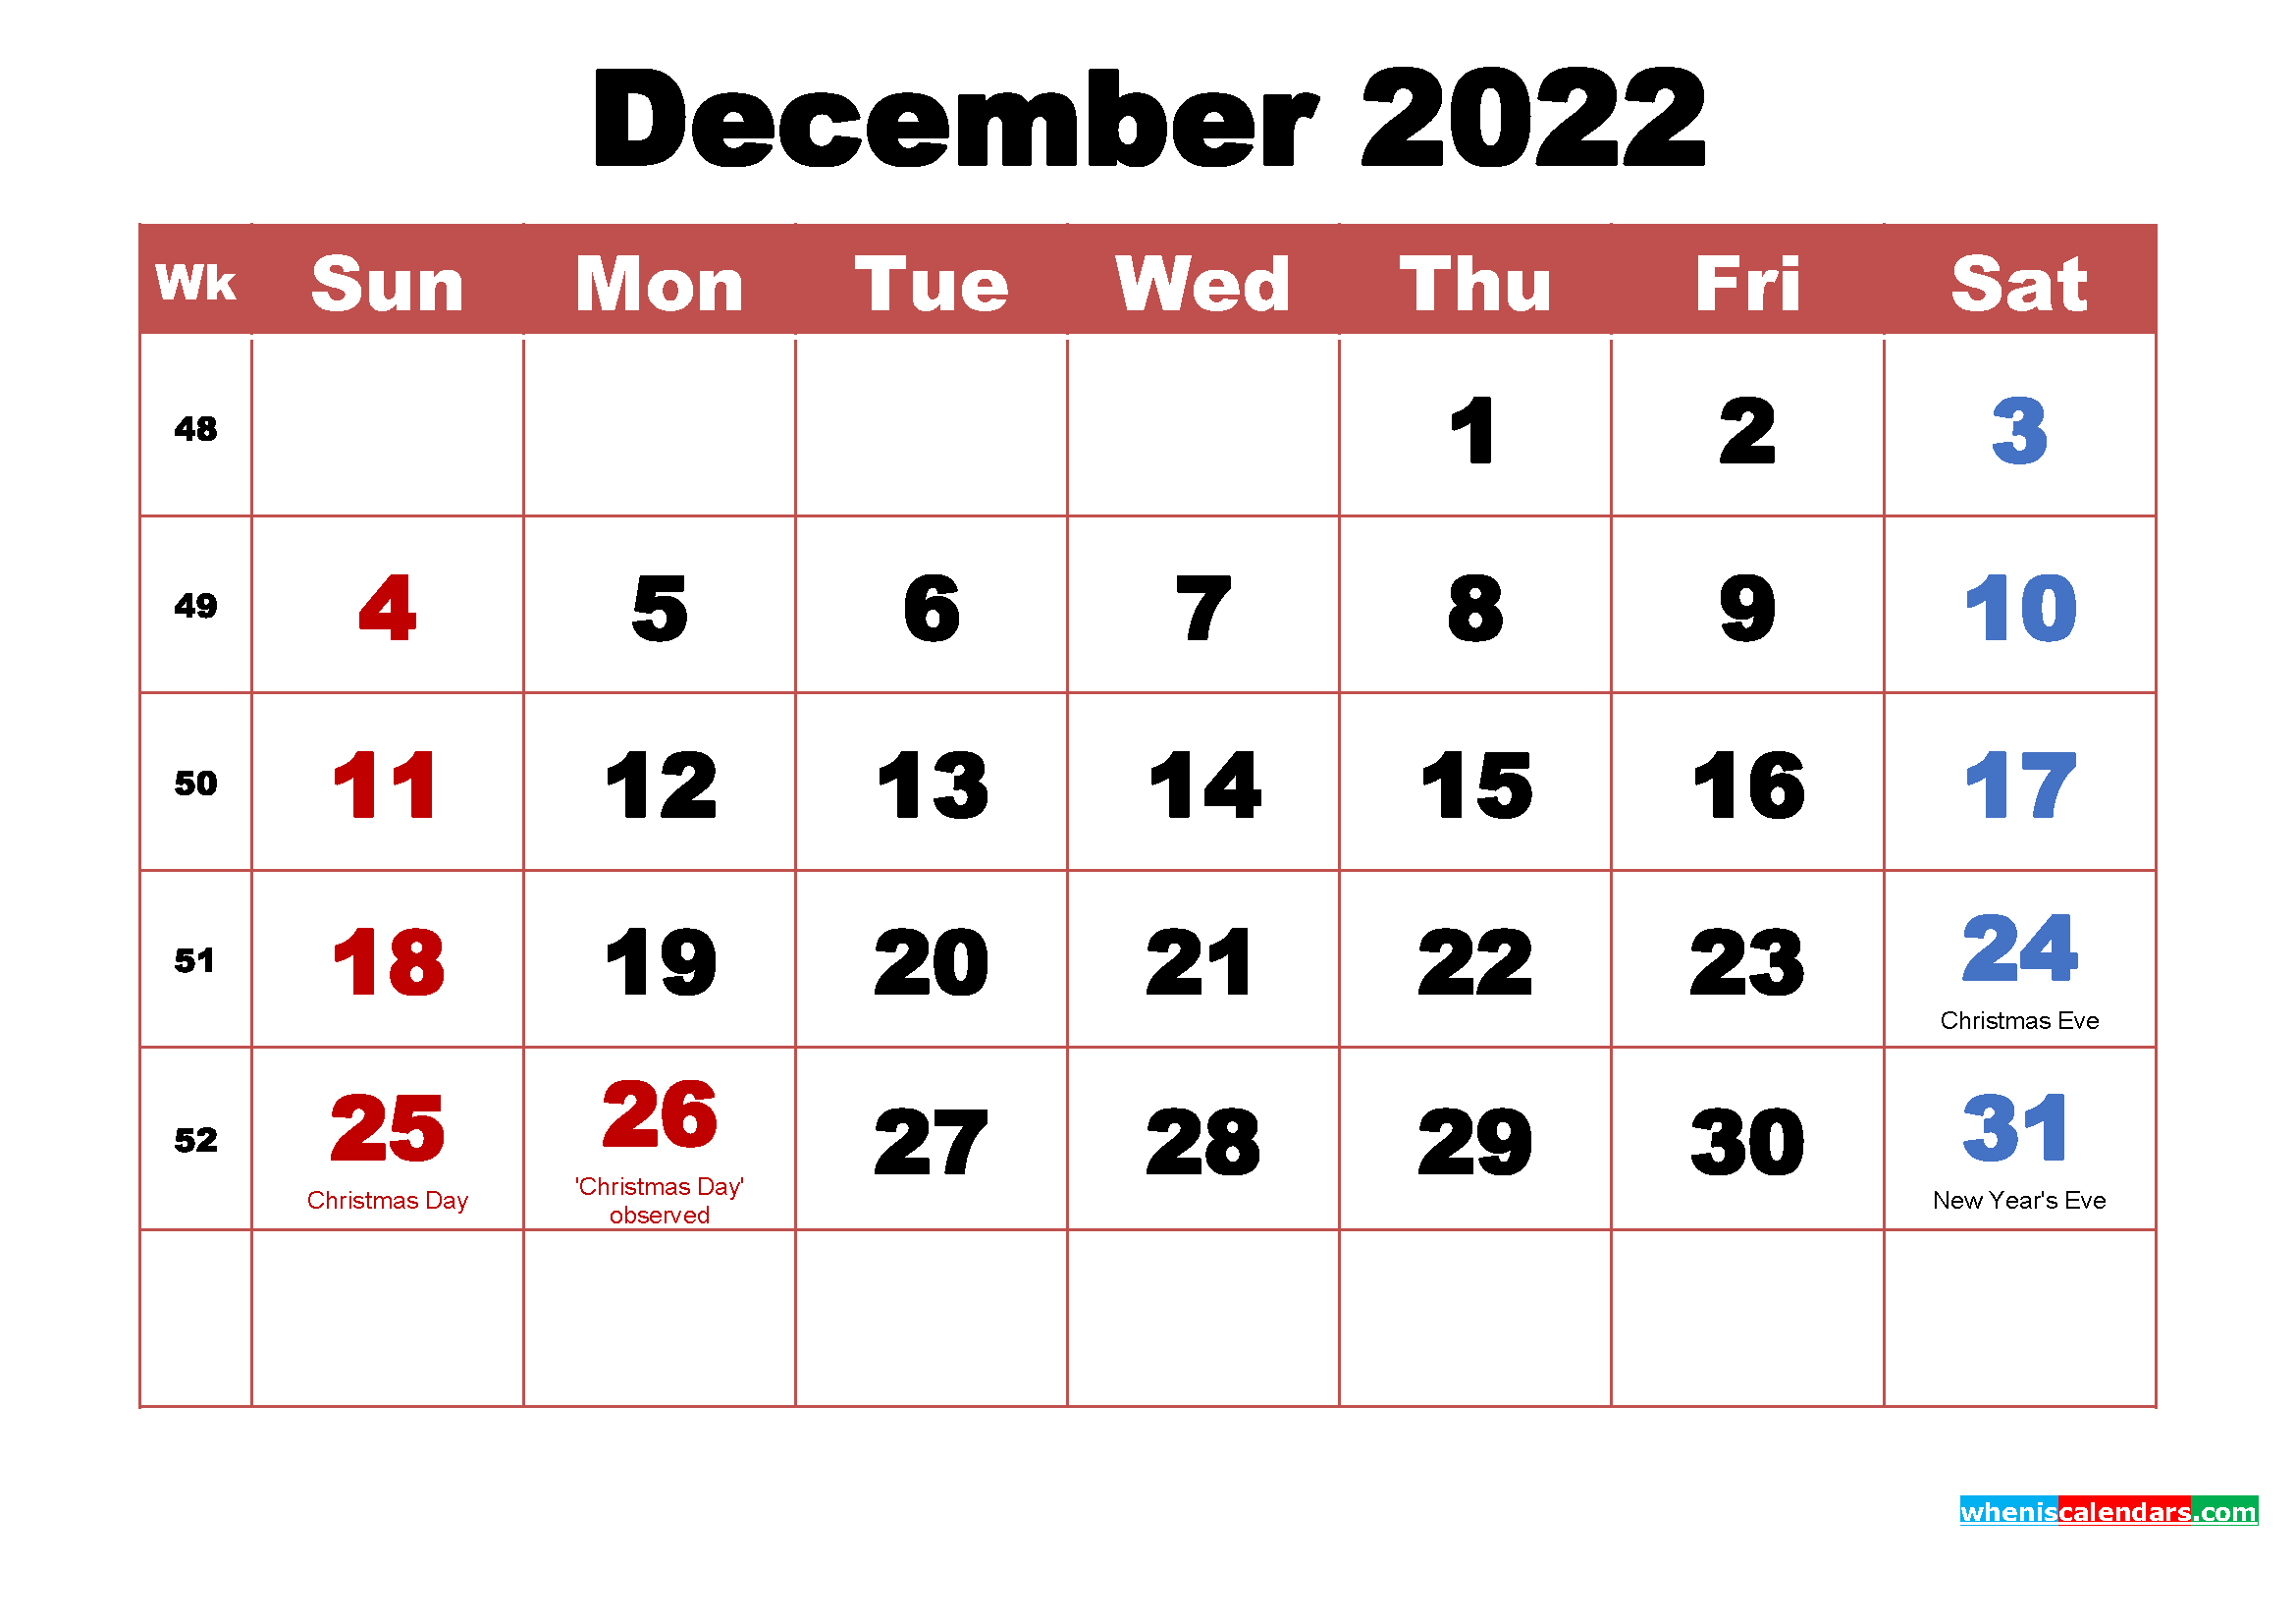 Calendar For December 2022.December 2022 Desktop Calendar High Resolution Free Printable 2021 Monthly Calendar With Holidays